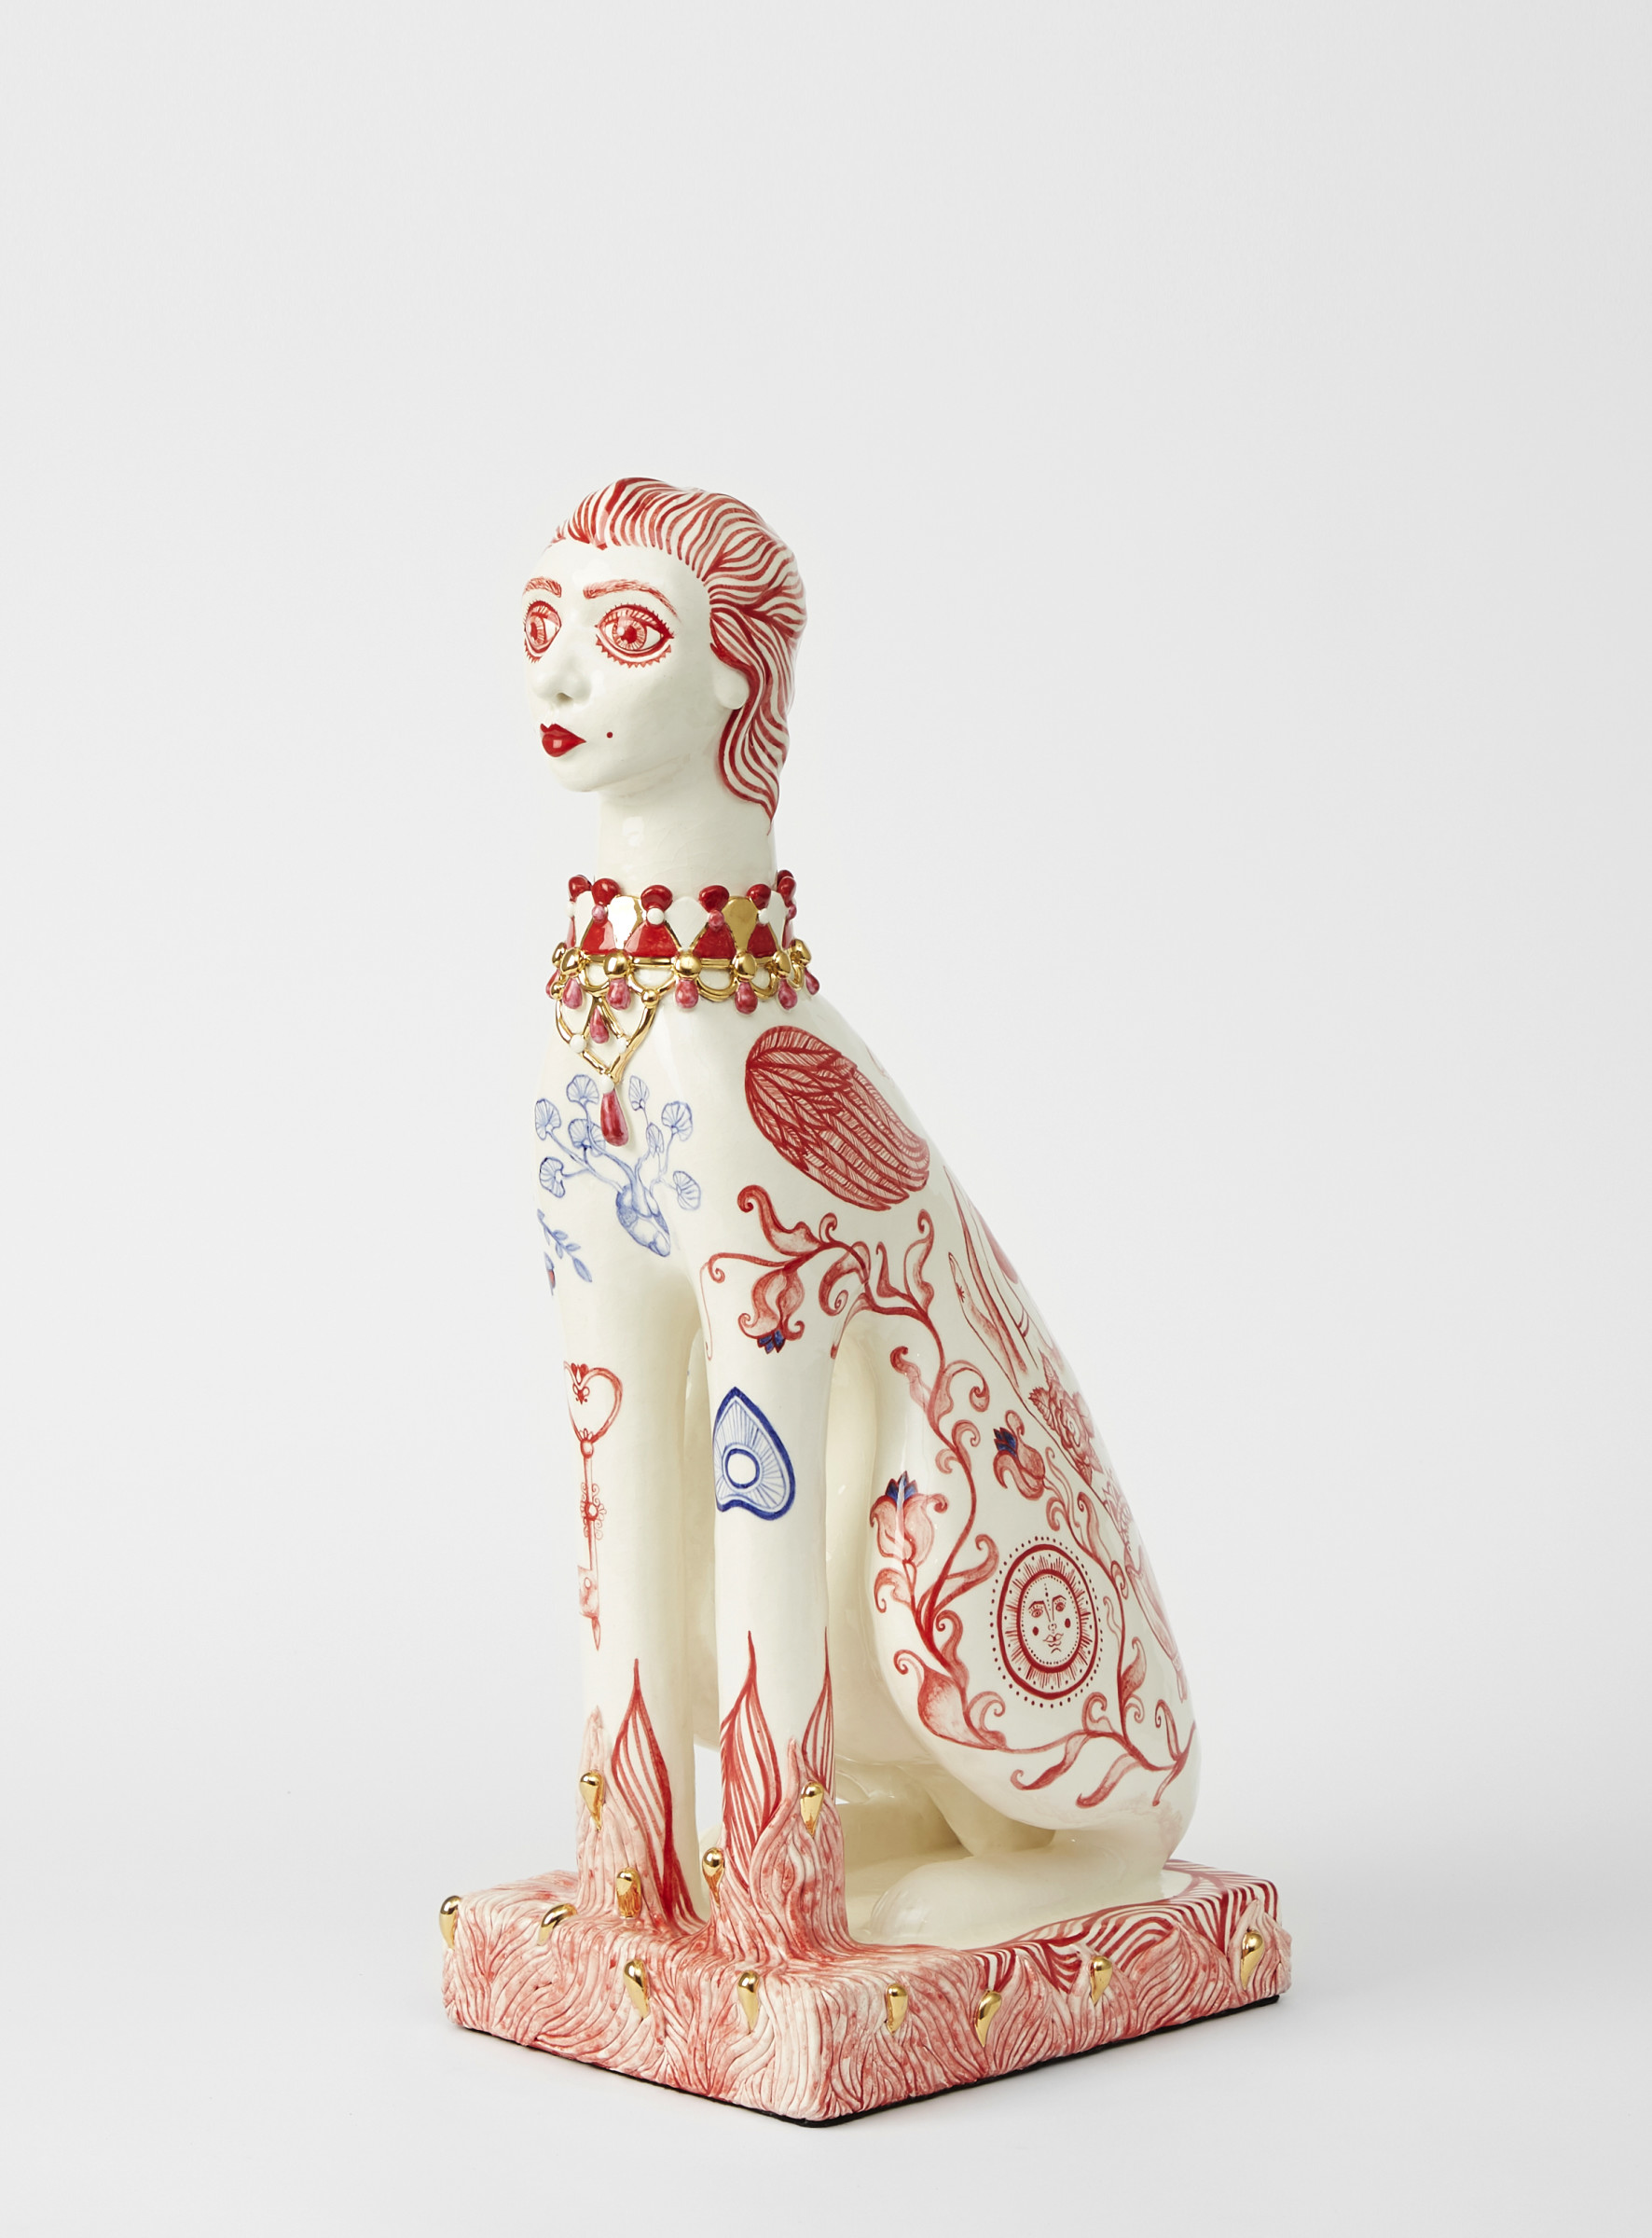 "<span class=""link fancybox-details-link""><a href=""/exhibitions/45/works/artworks3041/"">View Detail Page</a></span><div class=""artist""><strong>Anne Athena</strong></div><div class=""title""><em>Companion</em>, 2019</div><div class=""medium"">Hand Built and Hand Painted Ceramics</div><div class=""dimensions"">63 x 30 x 22 cm<br>24 3/4 x 11 3/4 x 8 5/8 in.</div>"